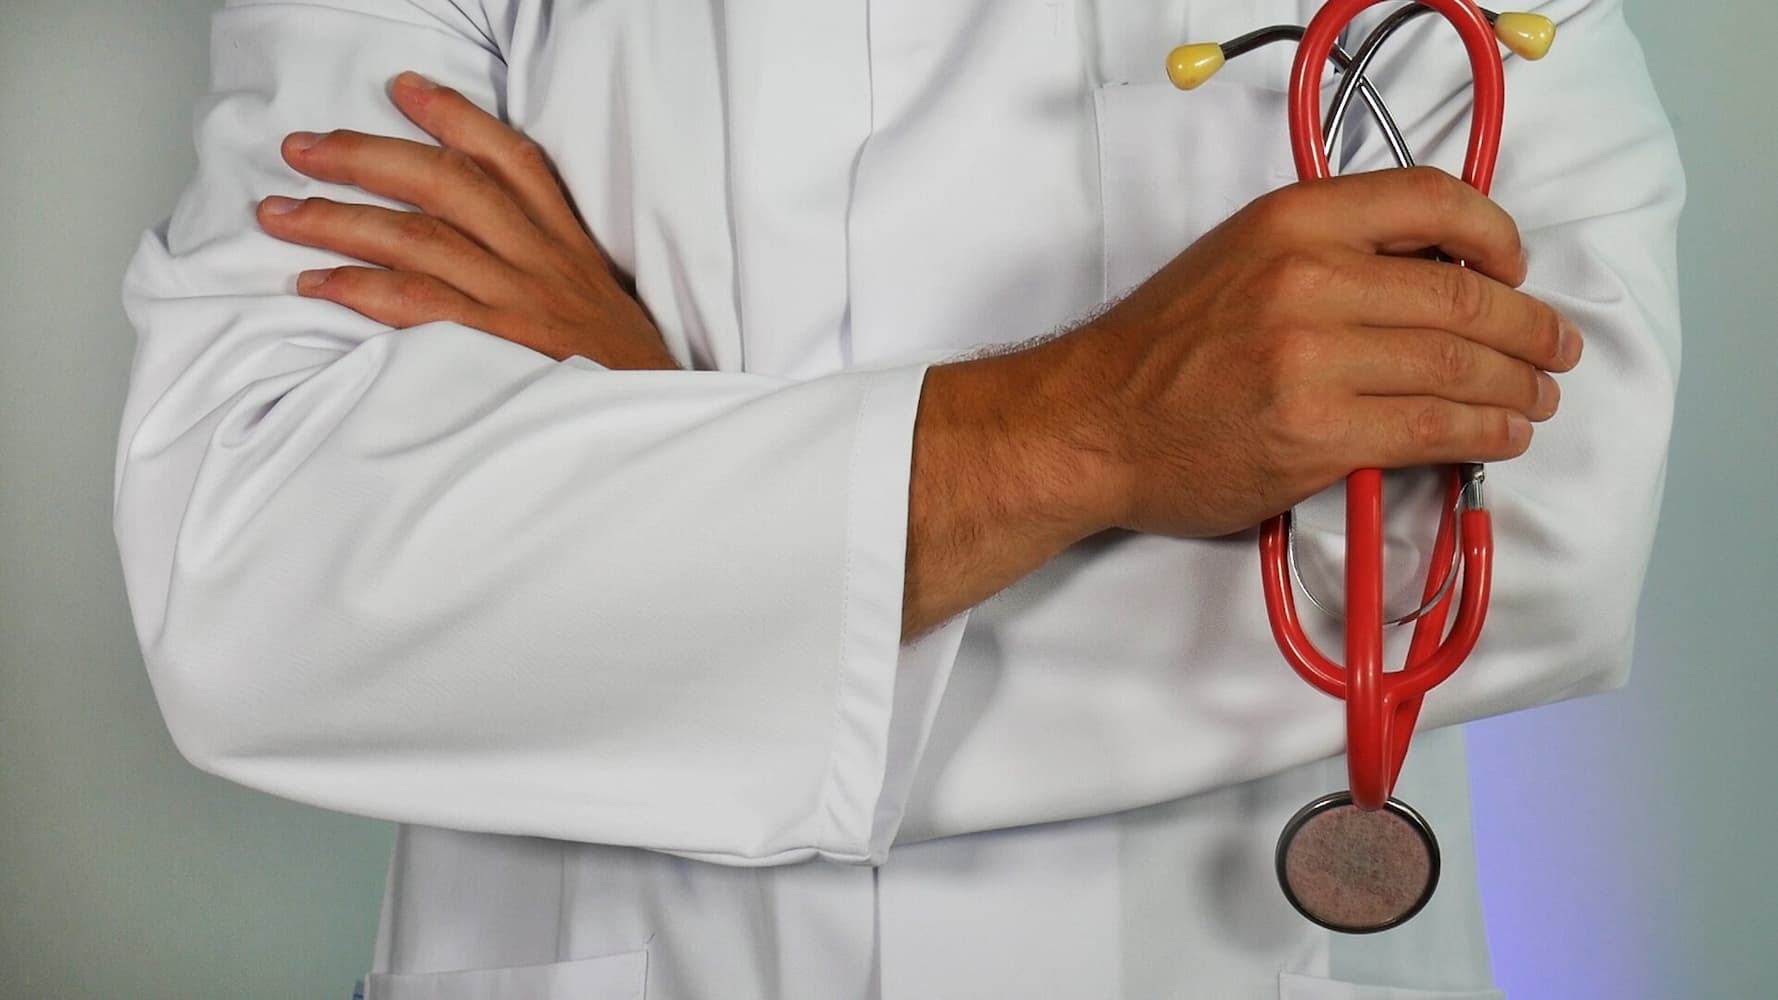 Holistic doctor courses in Australia